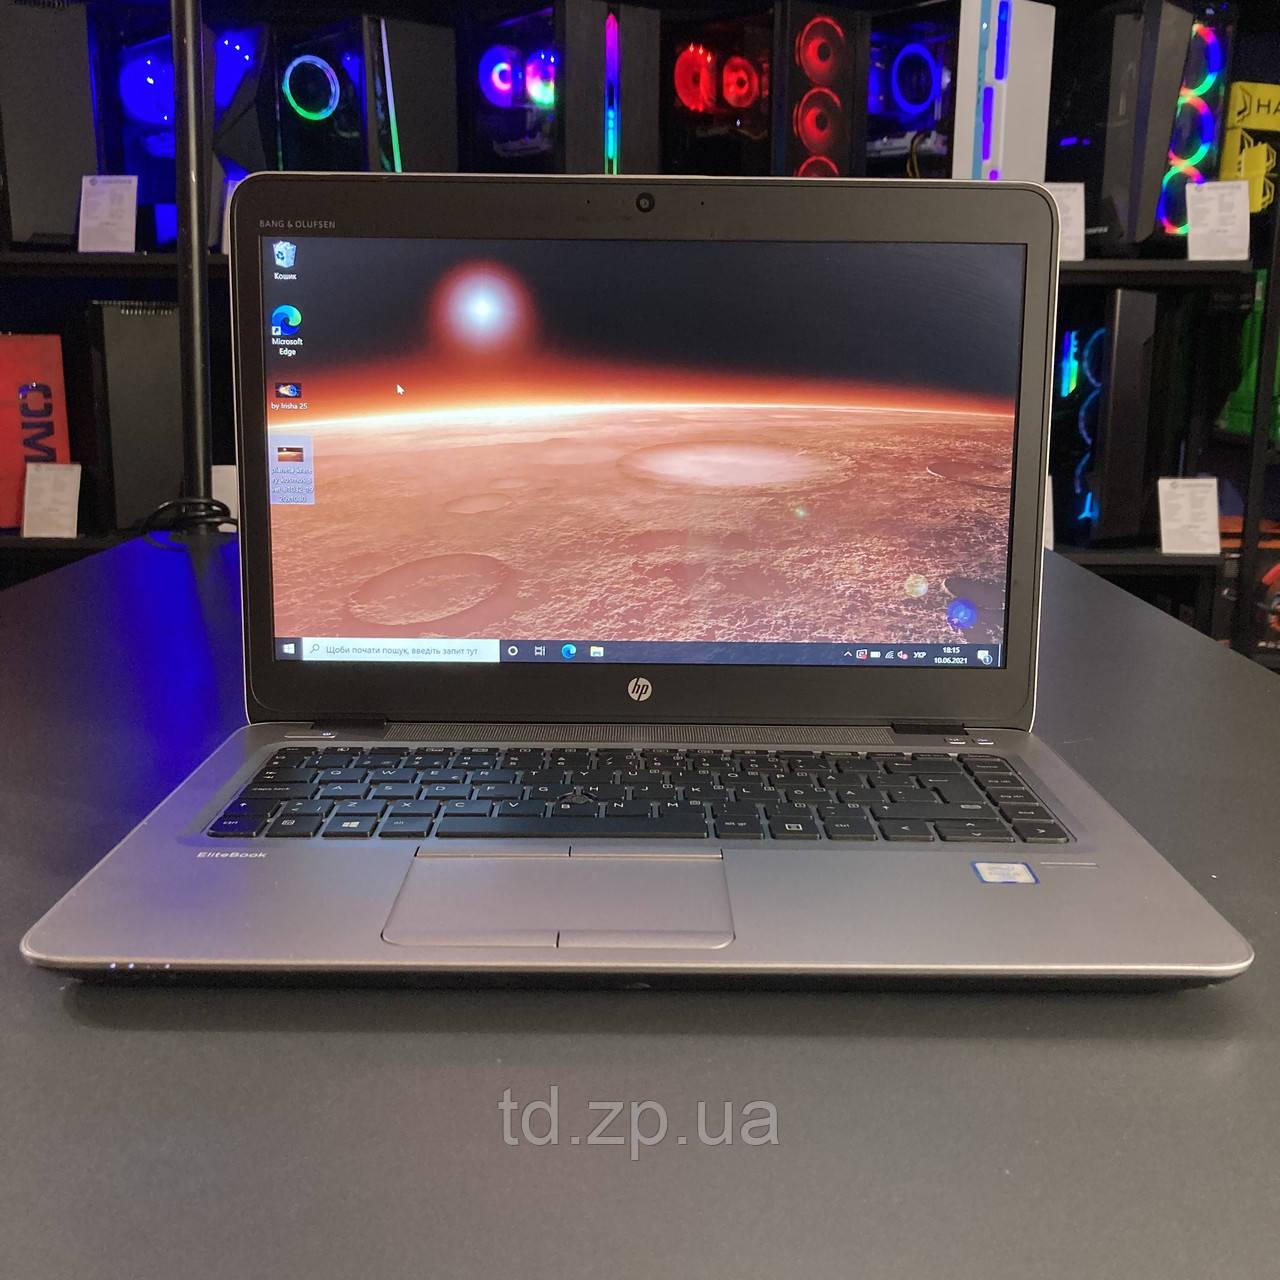 "Ноутбук HP EliteBook 840 G4 14""/Intel Core i5-7300u/8Gb DDR4/160Gb SSD"